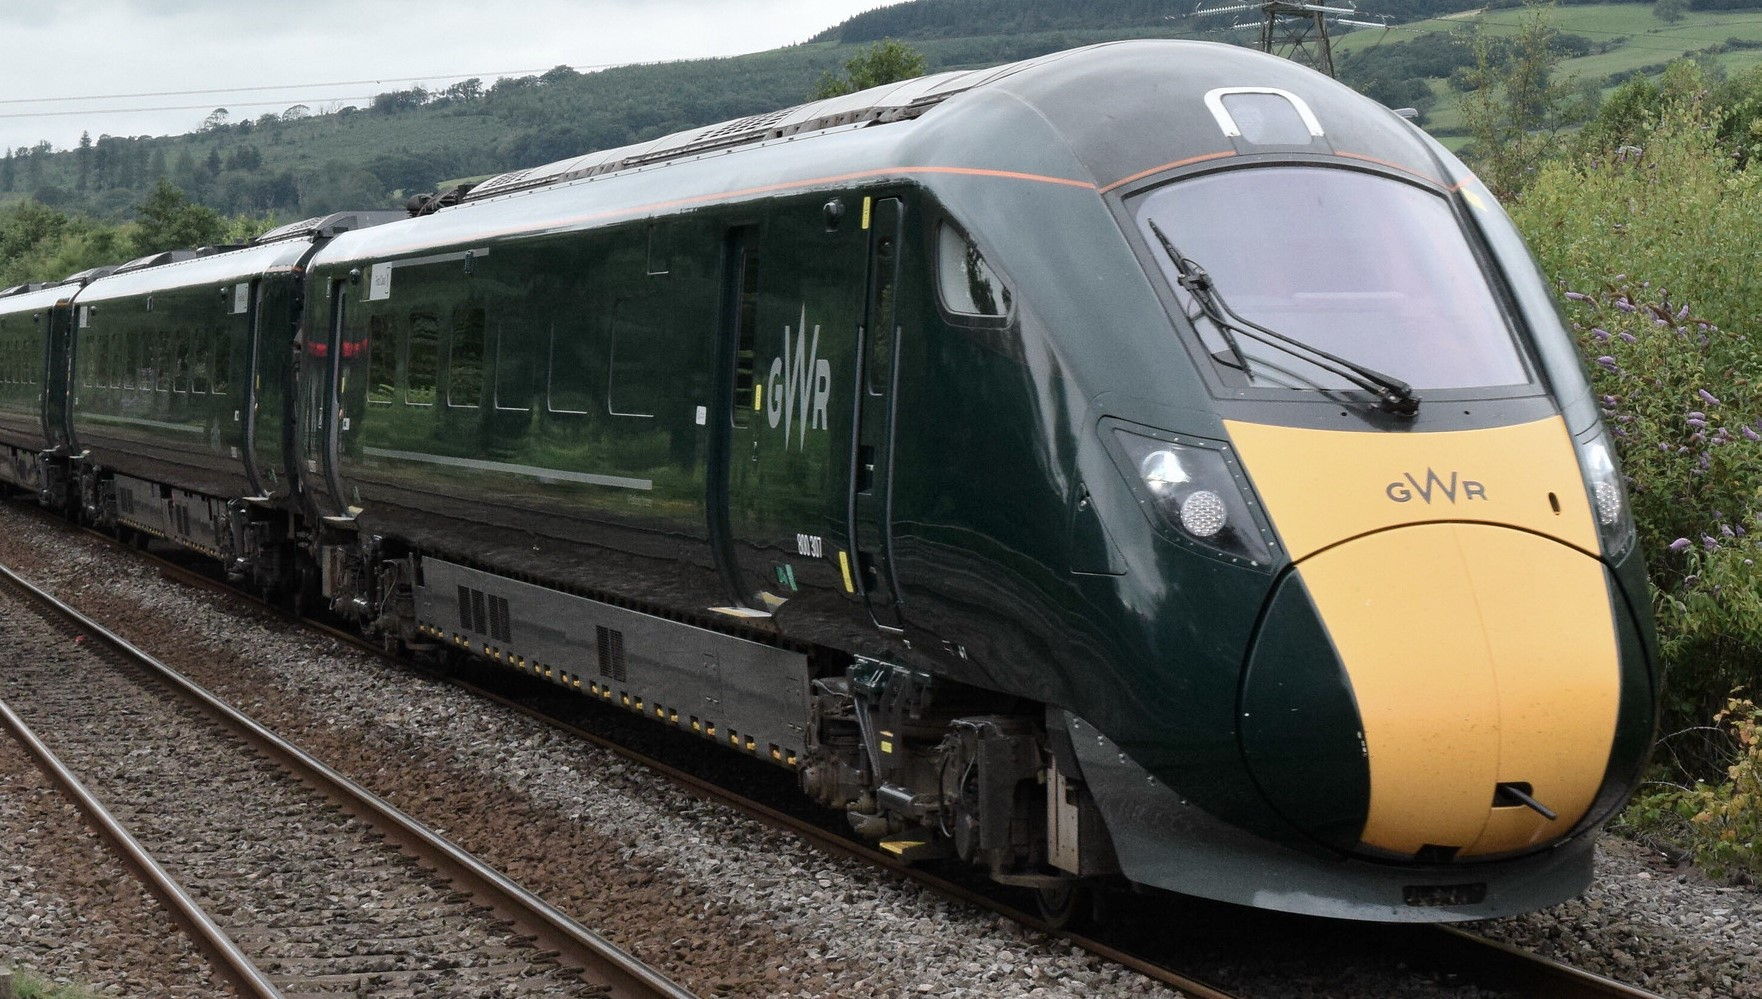 800307 near Pontyclun, South Wales in July 2020. ©Hugh Llewelyn